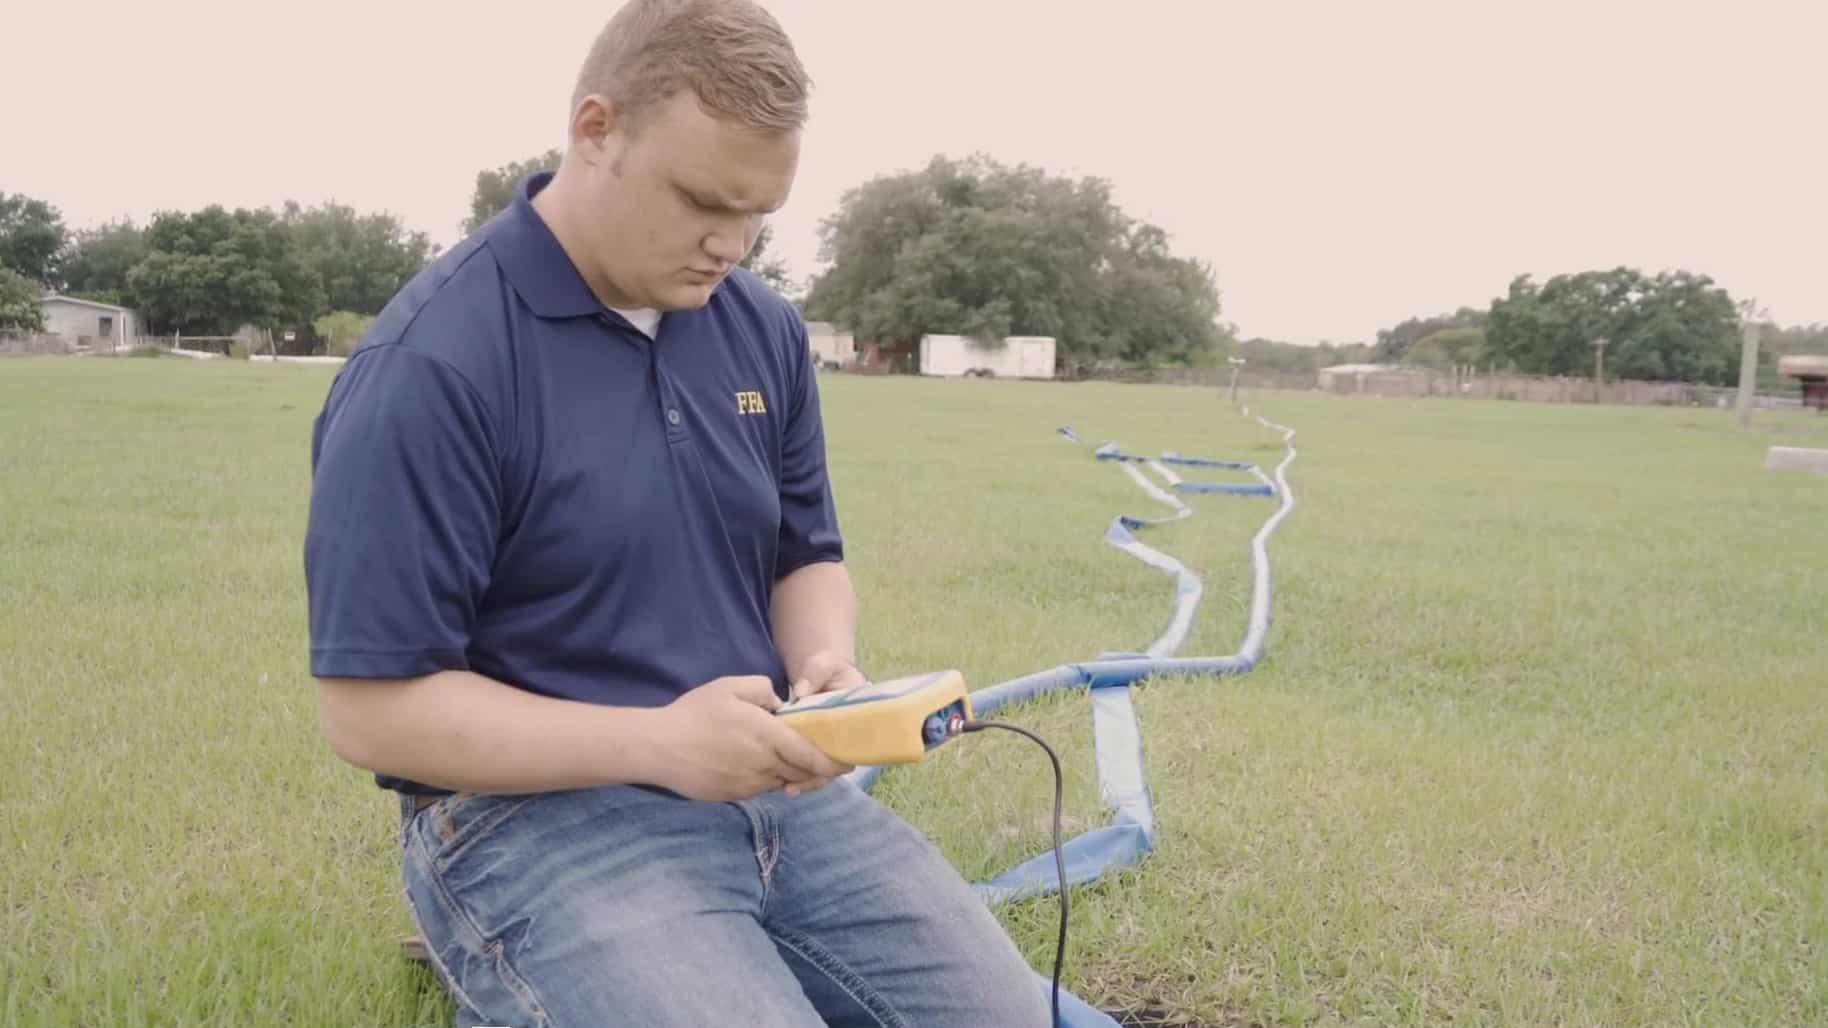 Turfgrass Management-Irrigation SAE - Featured Image